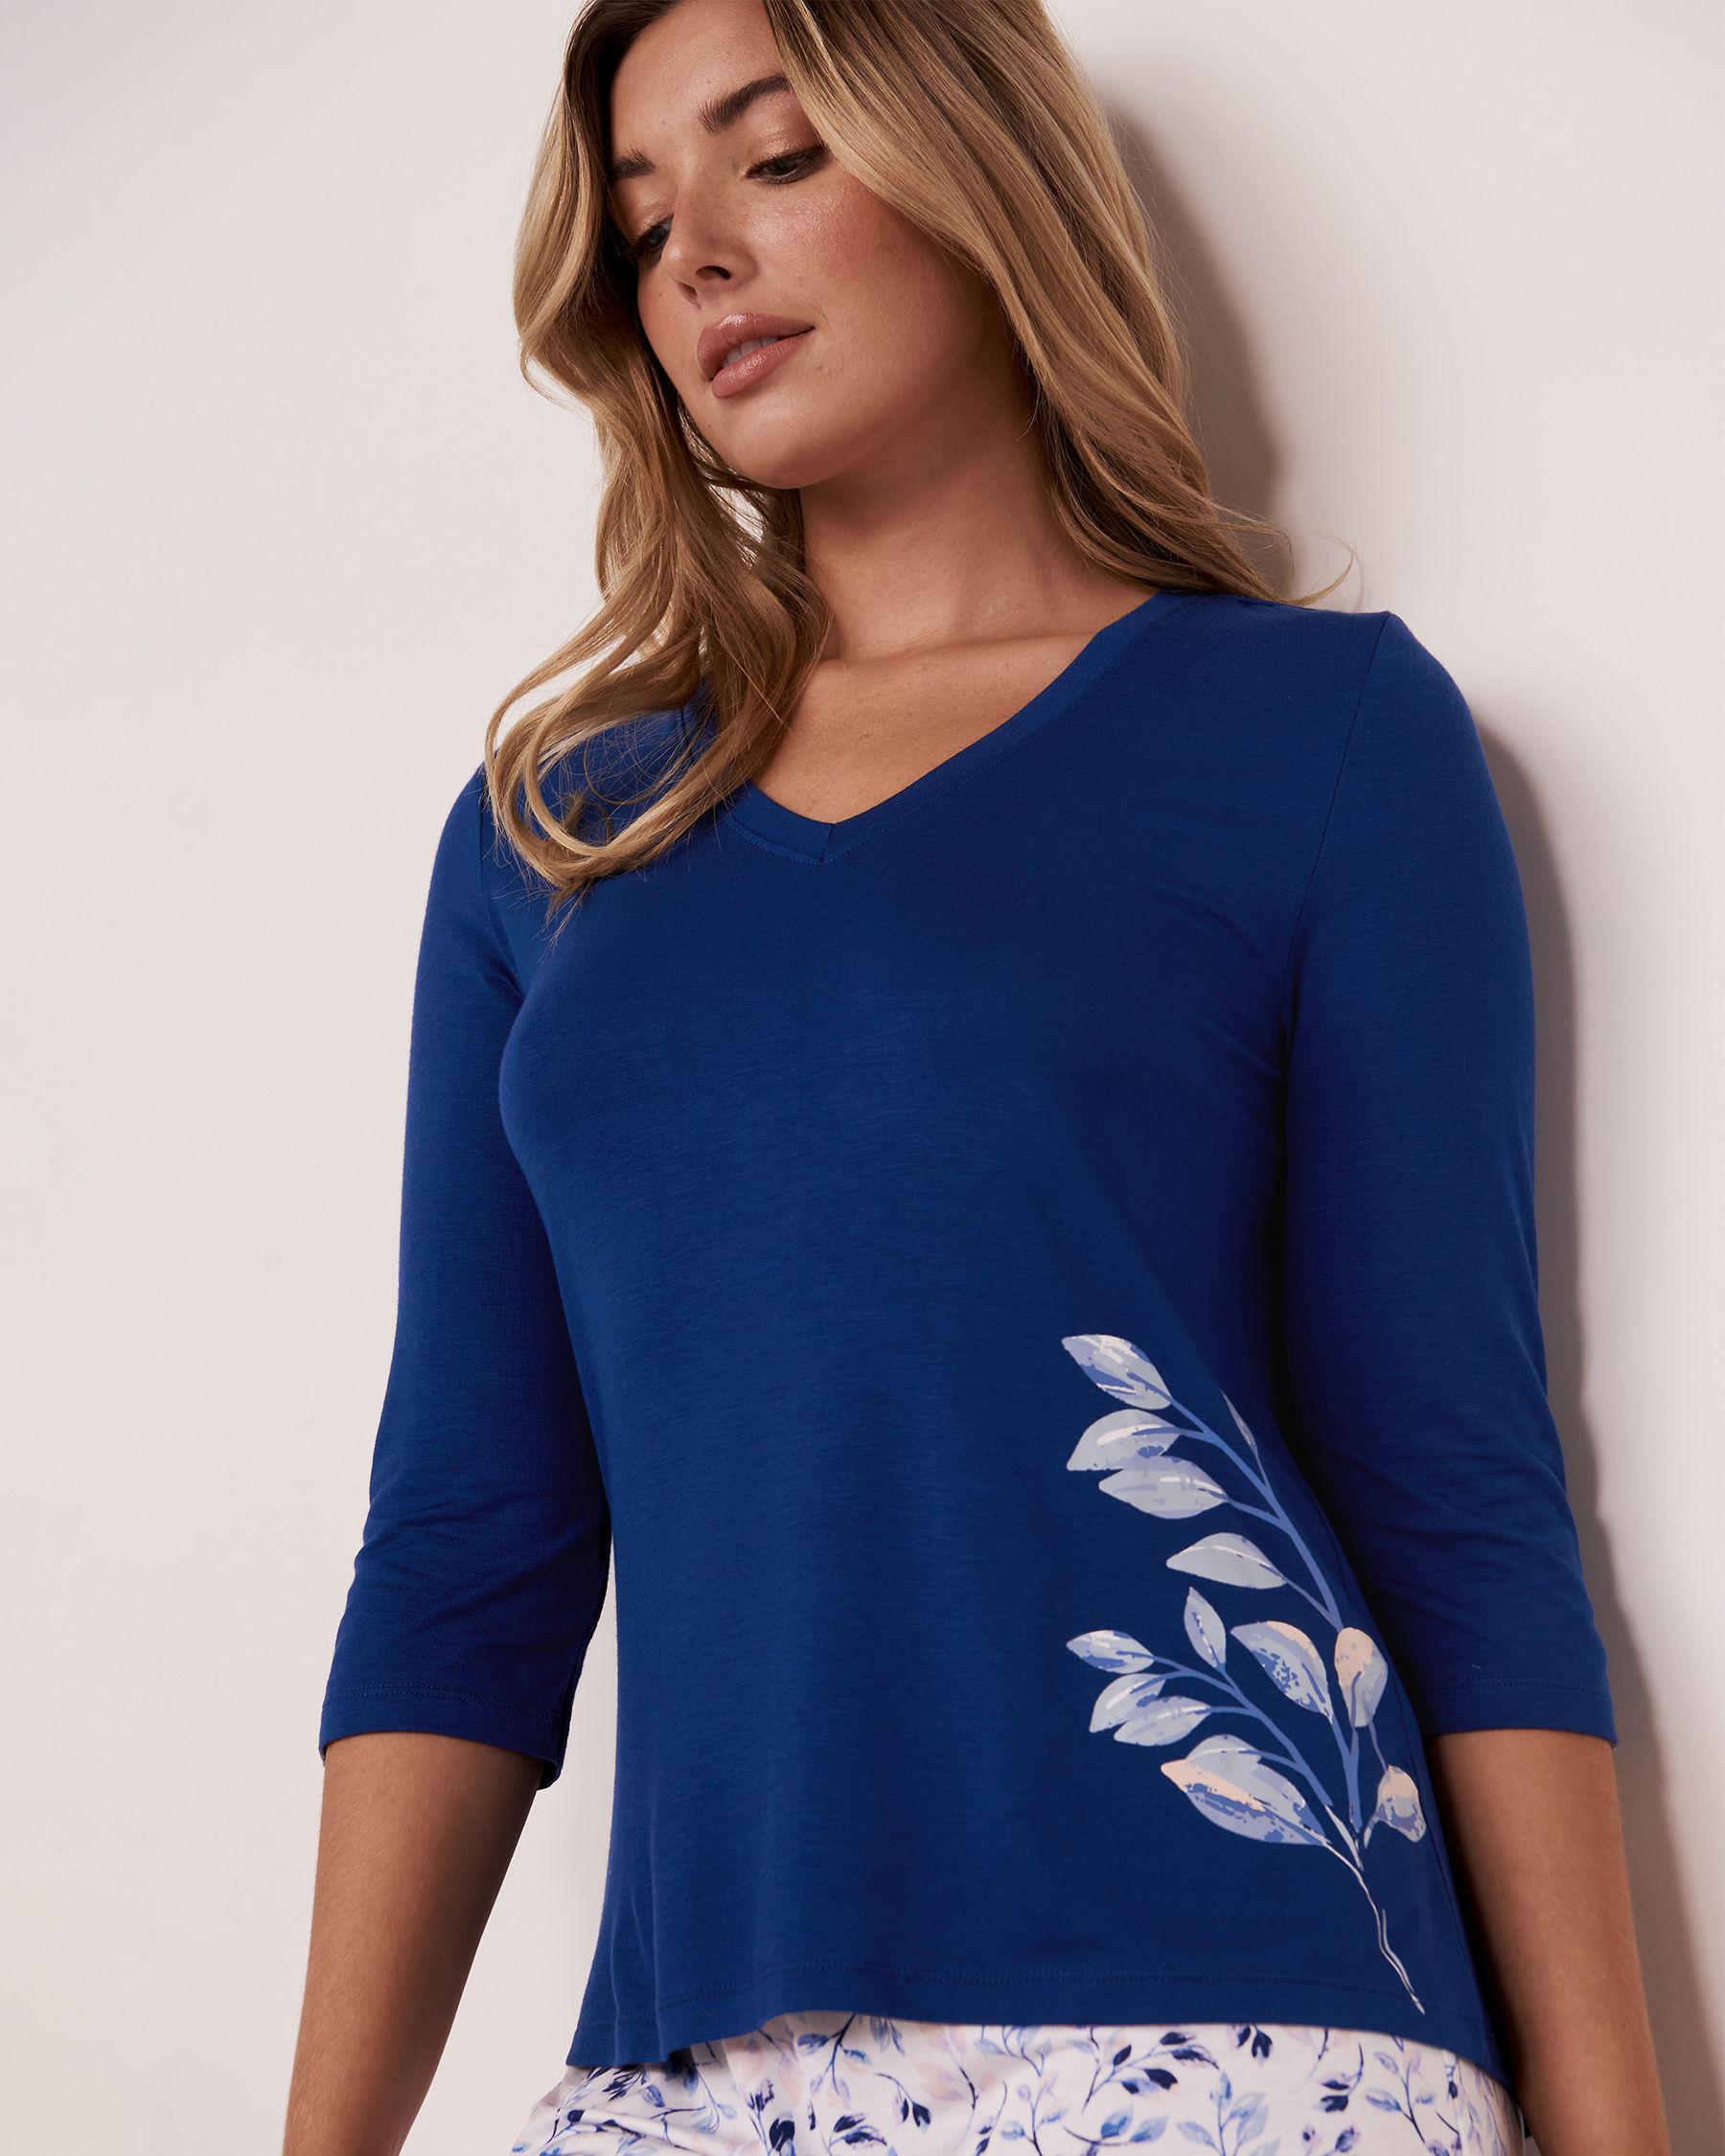 LA VIE EN ROSE V-neck 3/4 Sleeve Shirt Blue 40100072 - View3